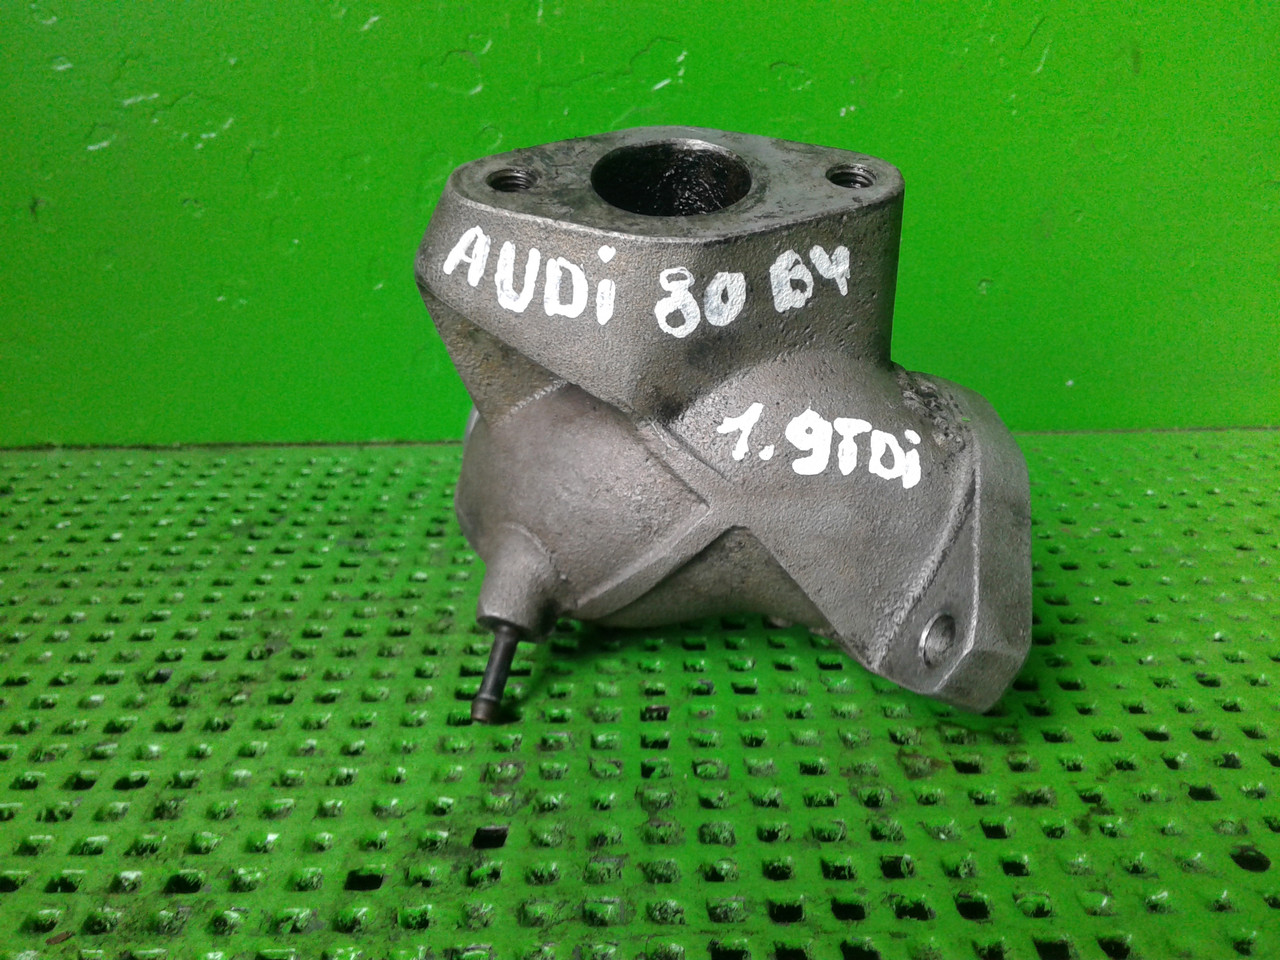 Бу клапан рециркуляции отработавших газов (EGR) Фланец впускного коллектора для Audi 80 - 90 - S2 ( B4 ), Volk